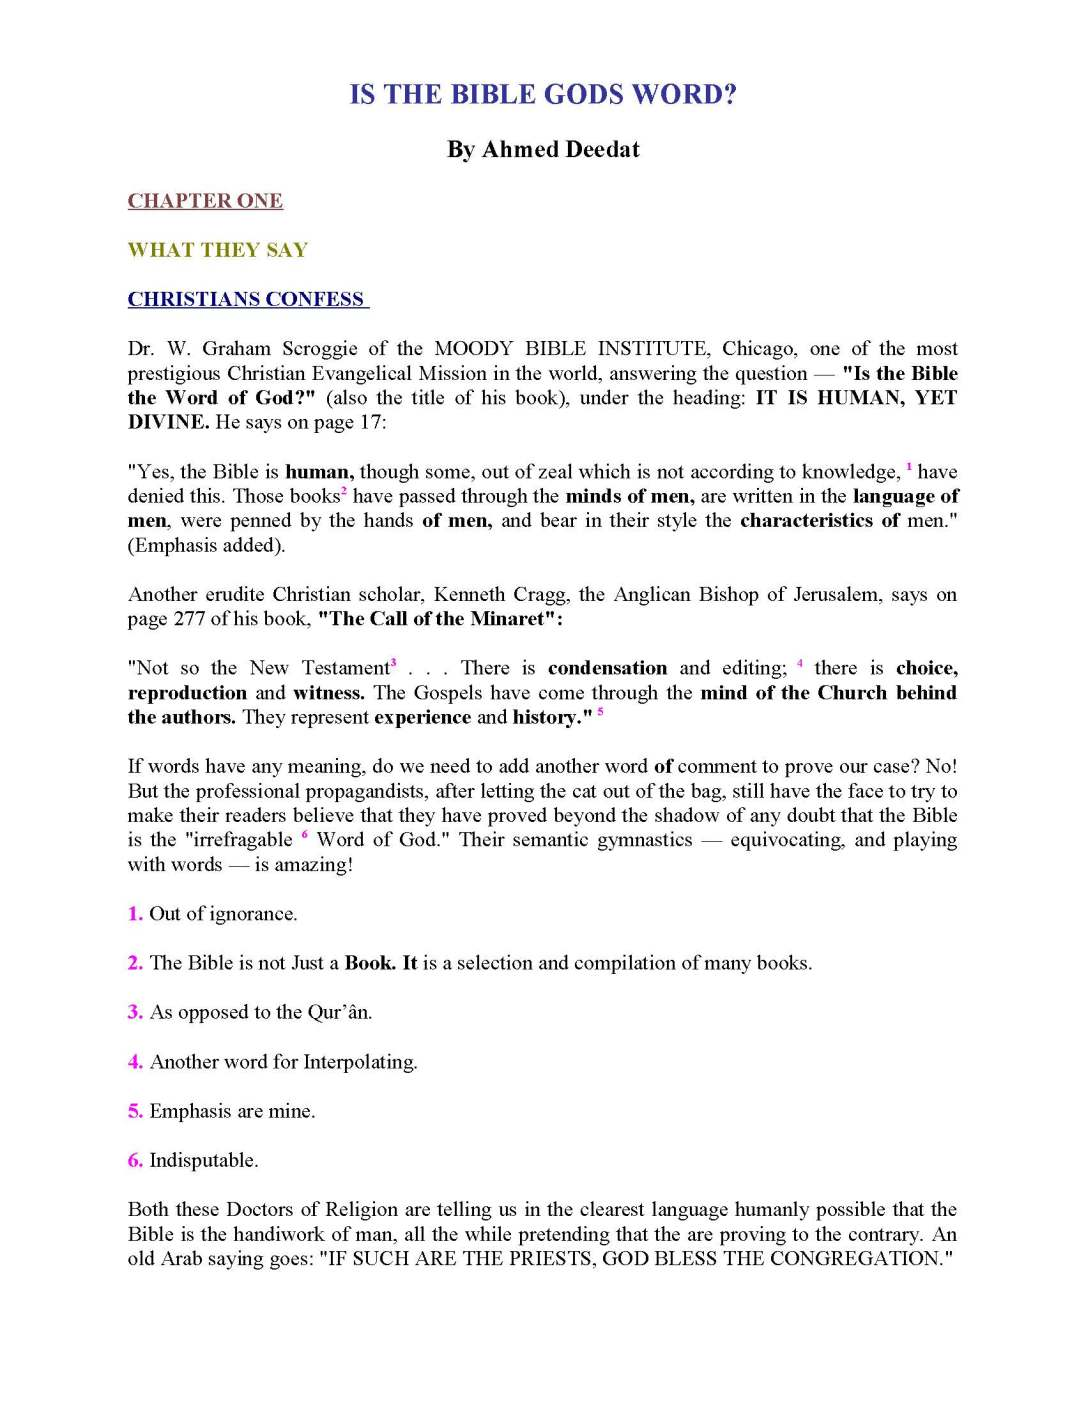 Is The Bible Gods Word [deedat]_Page_01